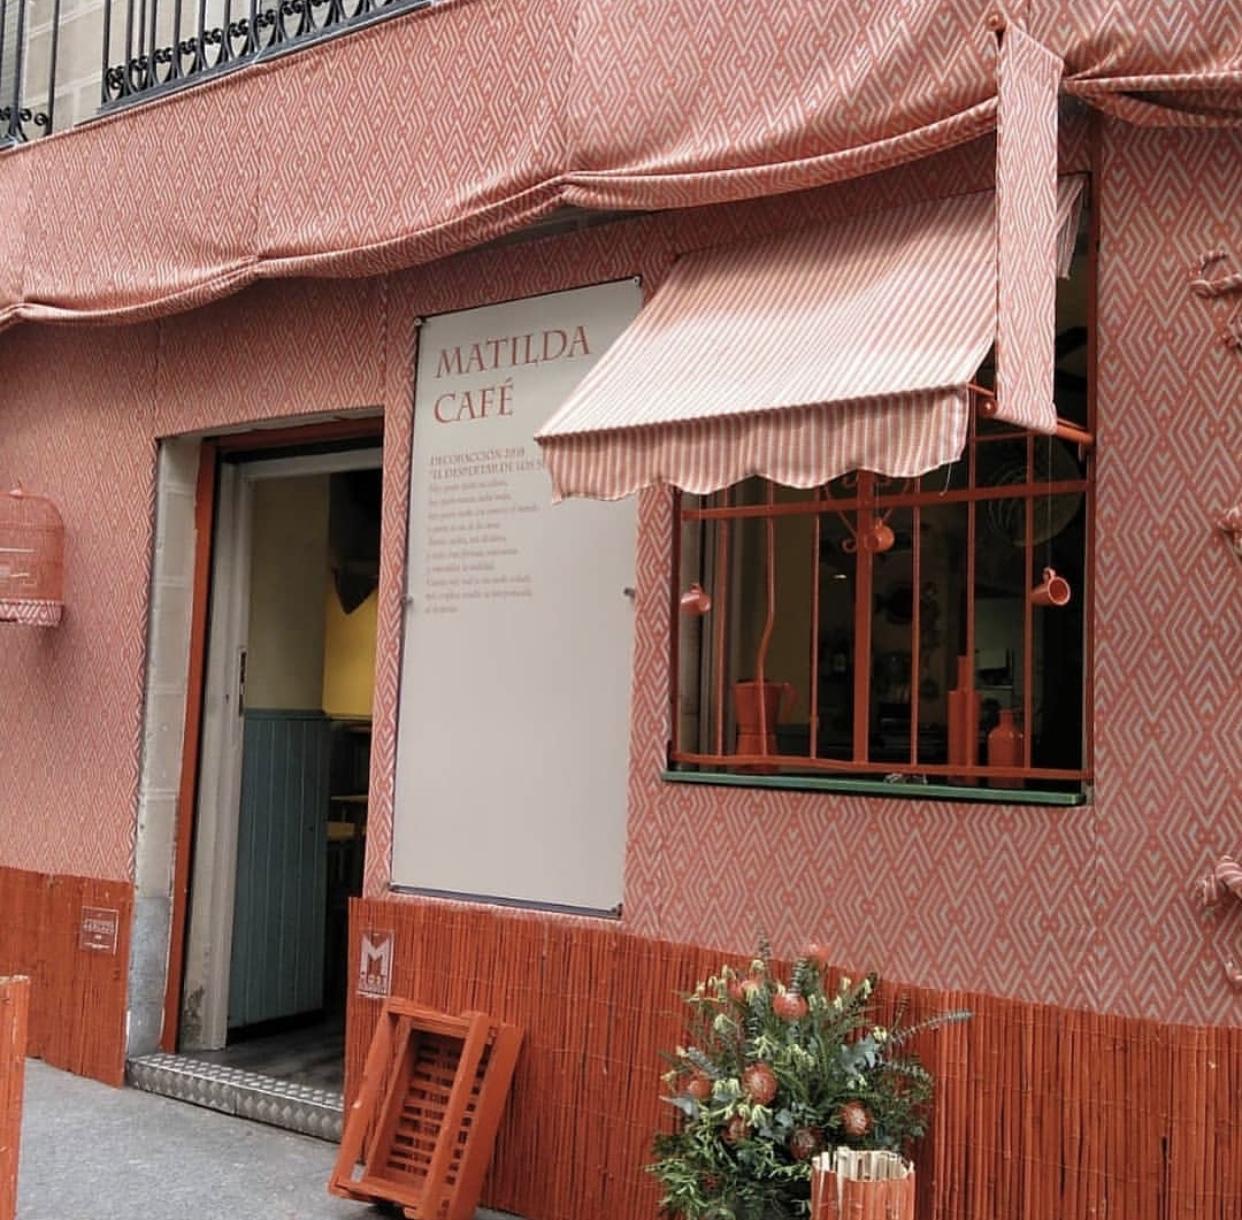 Facade Matilda Cafe Cantina - Madrid, Spain